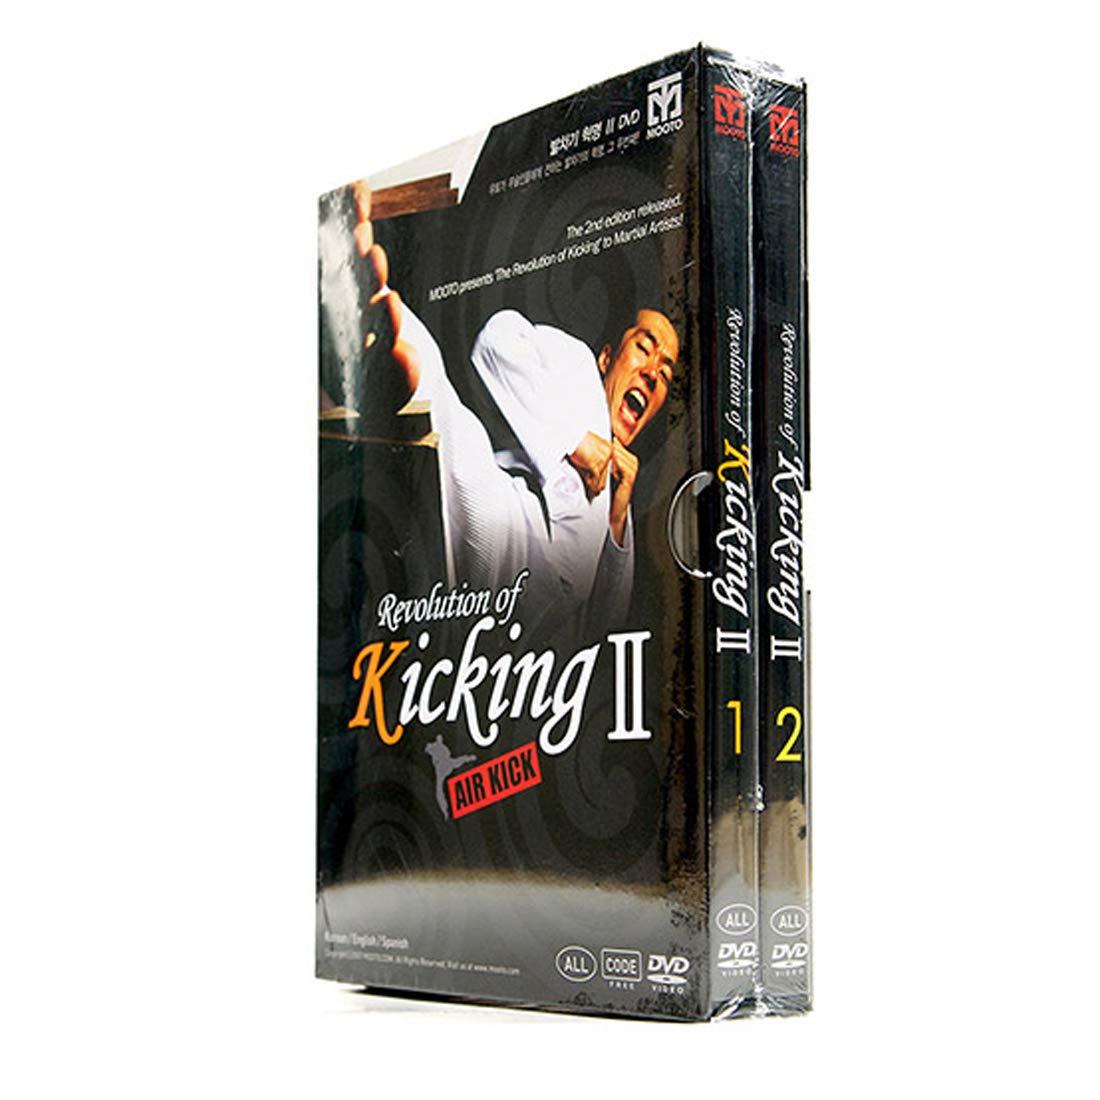 Mooto Korea Taekwondo DVD Title Revolution of Kicking 2-Air Kick_DVD MMA TKD Martial Arts Match Judo Karate Gym Academy Kicking Training by Mooto